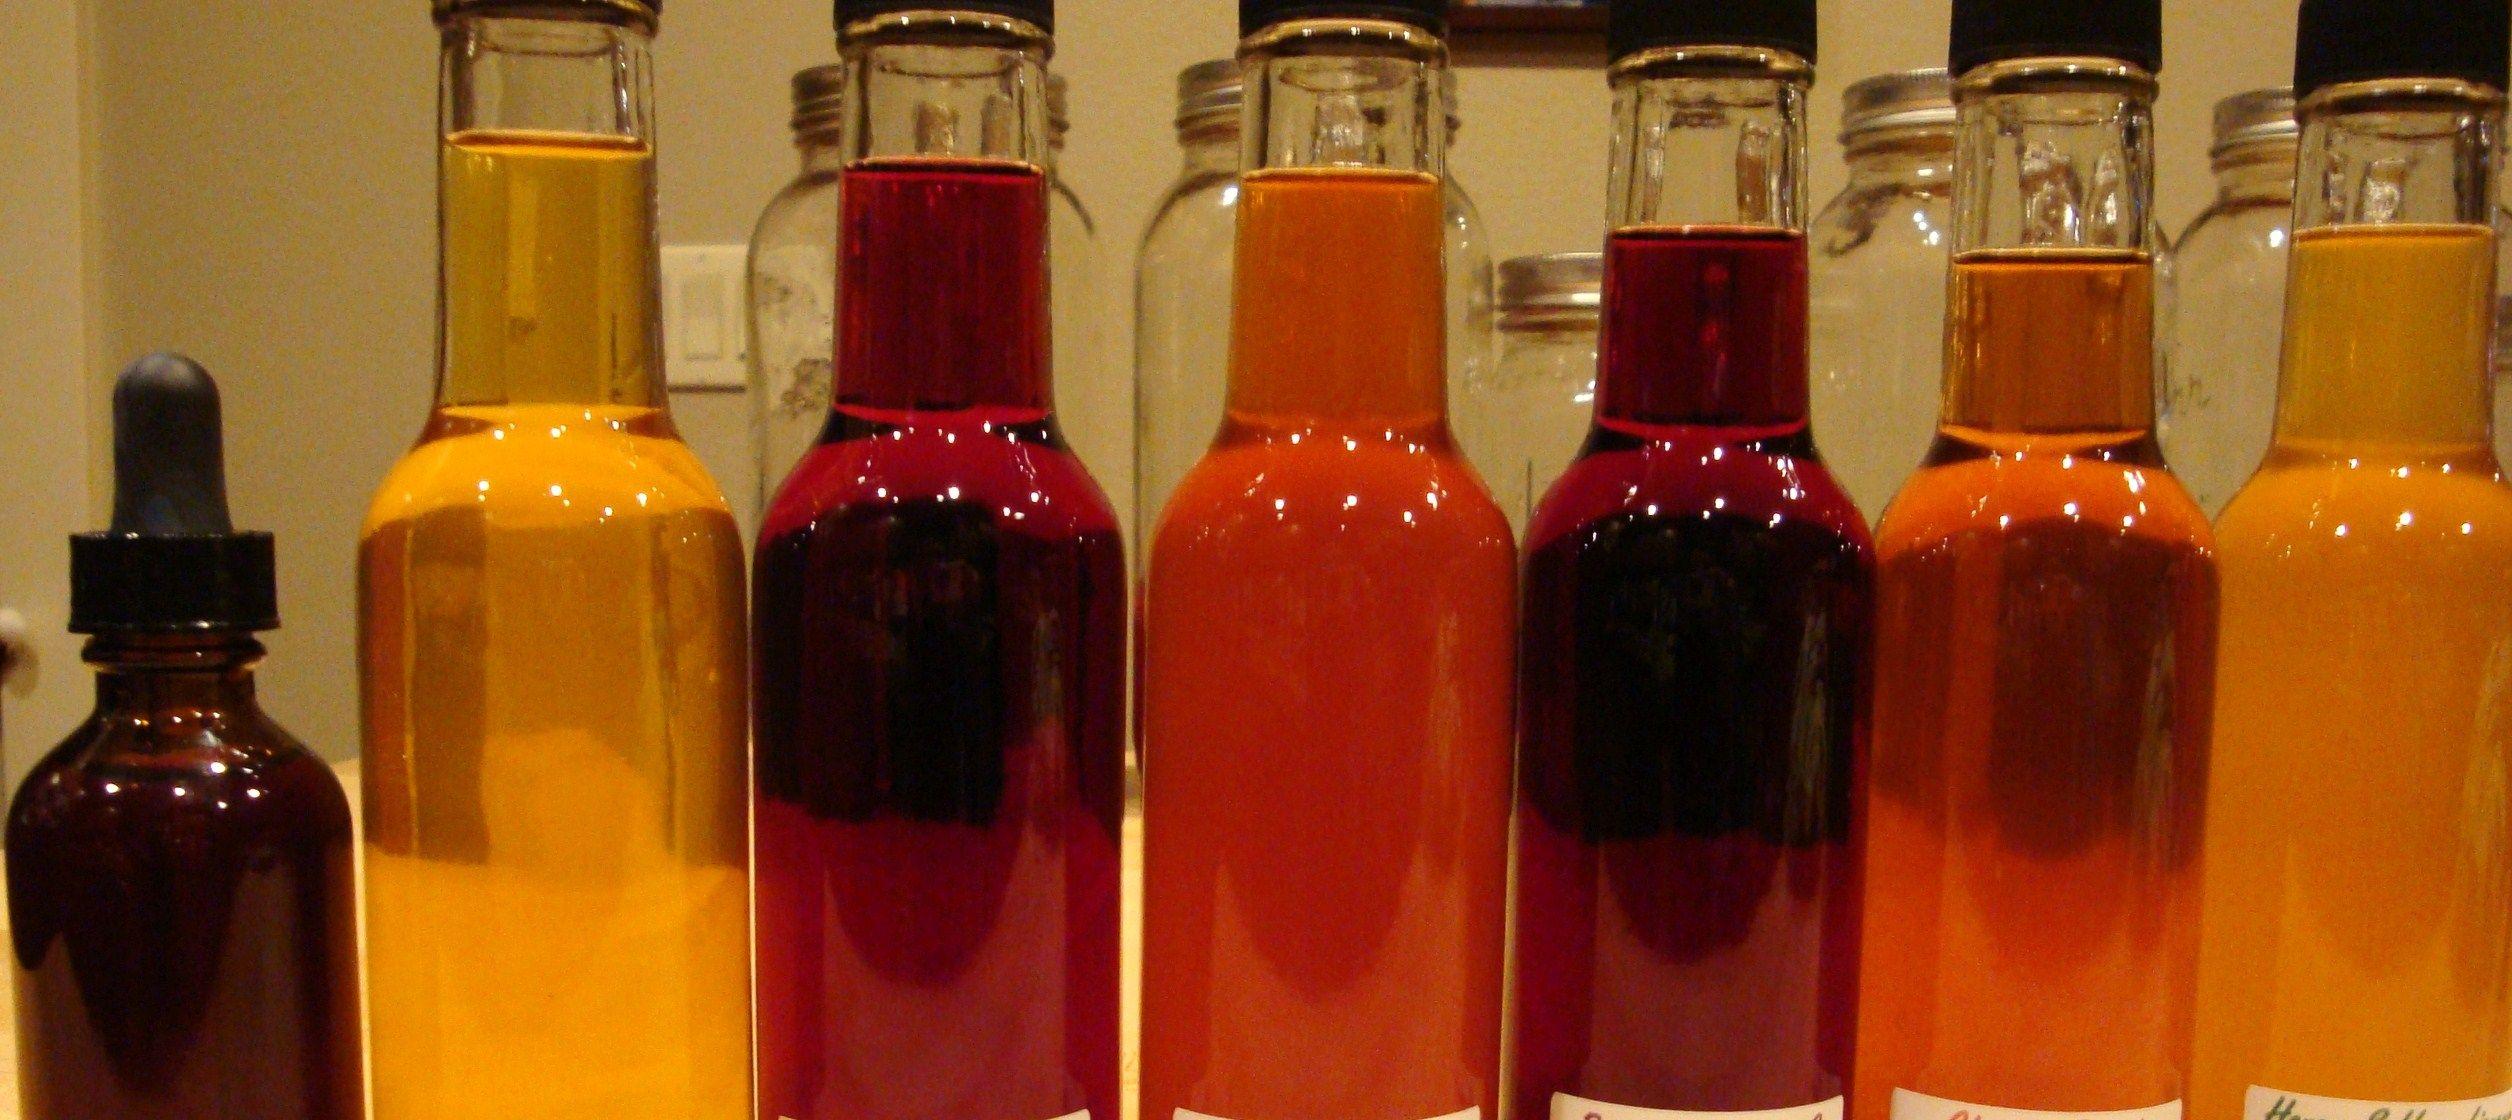 Straining And Filtering Liqueurs Liqueur Distillation Bottle Gift